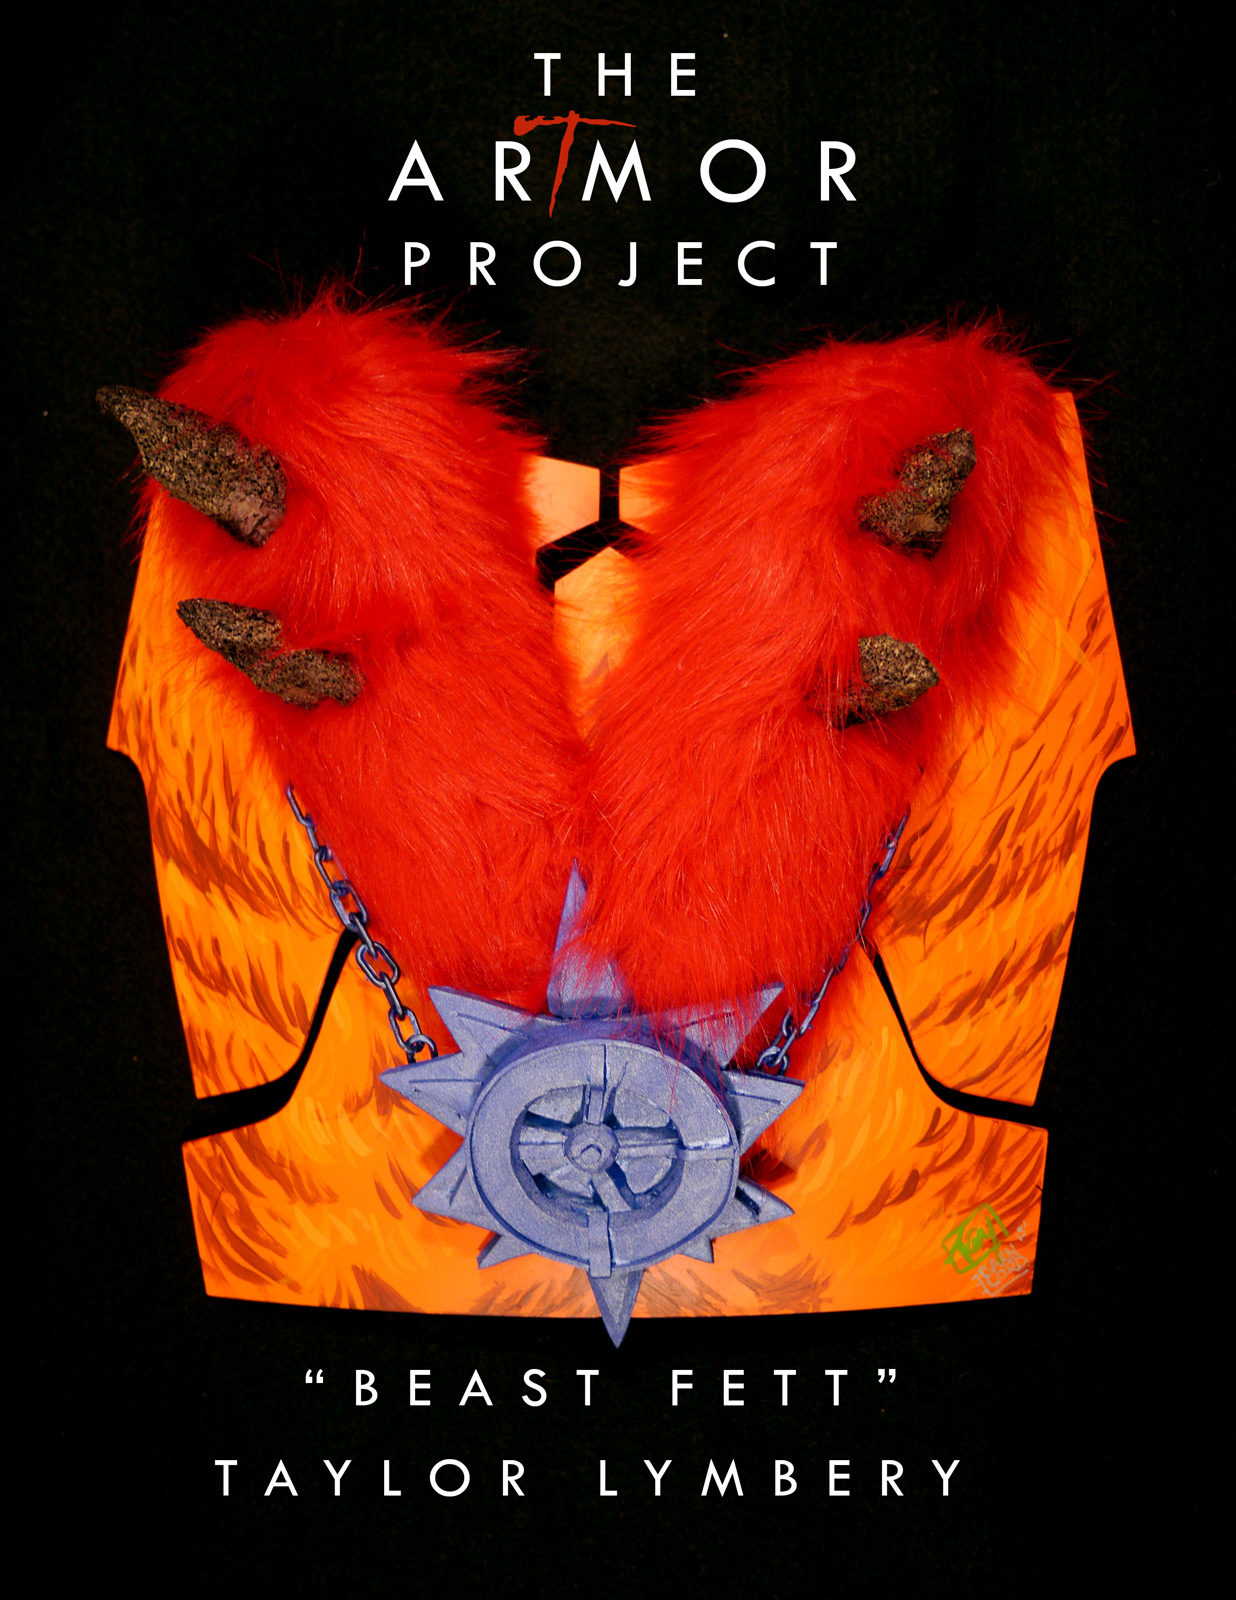 ArTmor 2015: Beast Fett